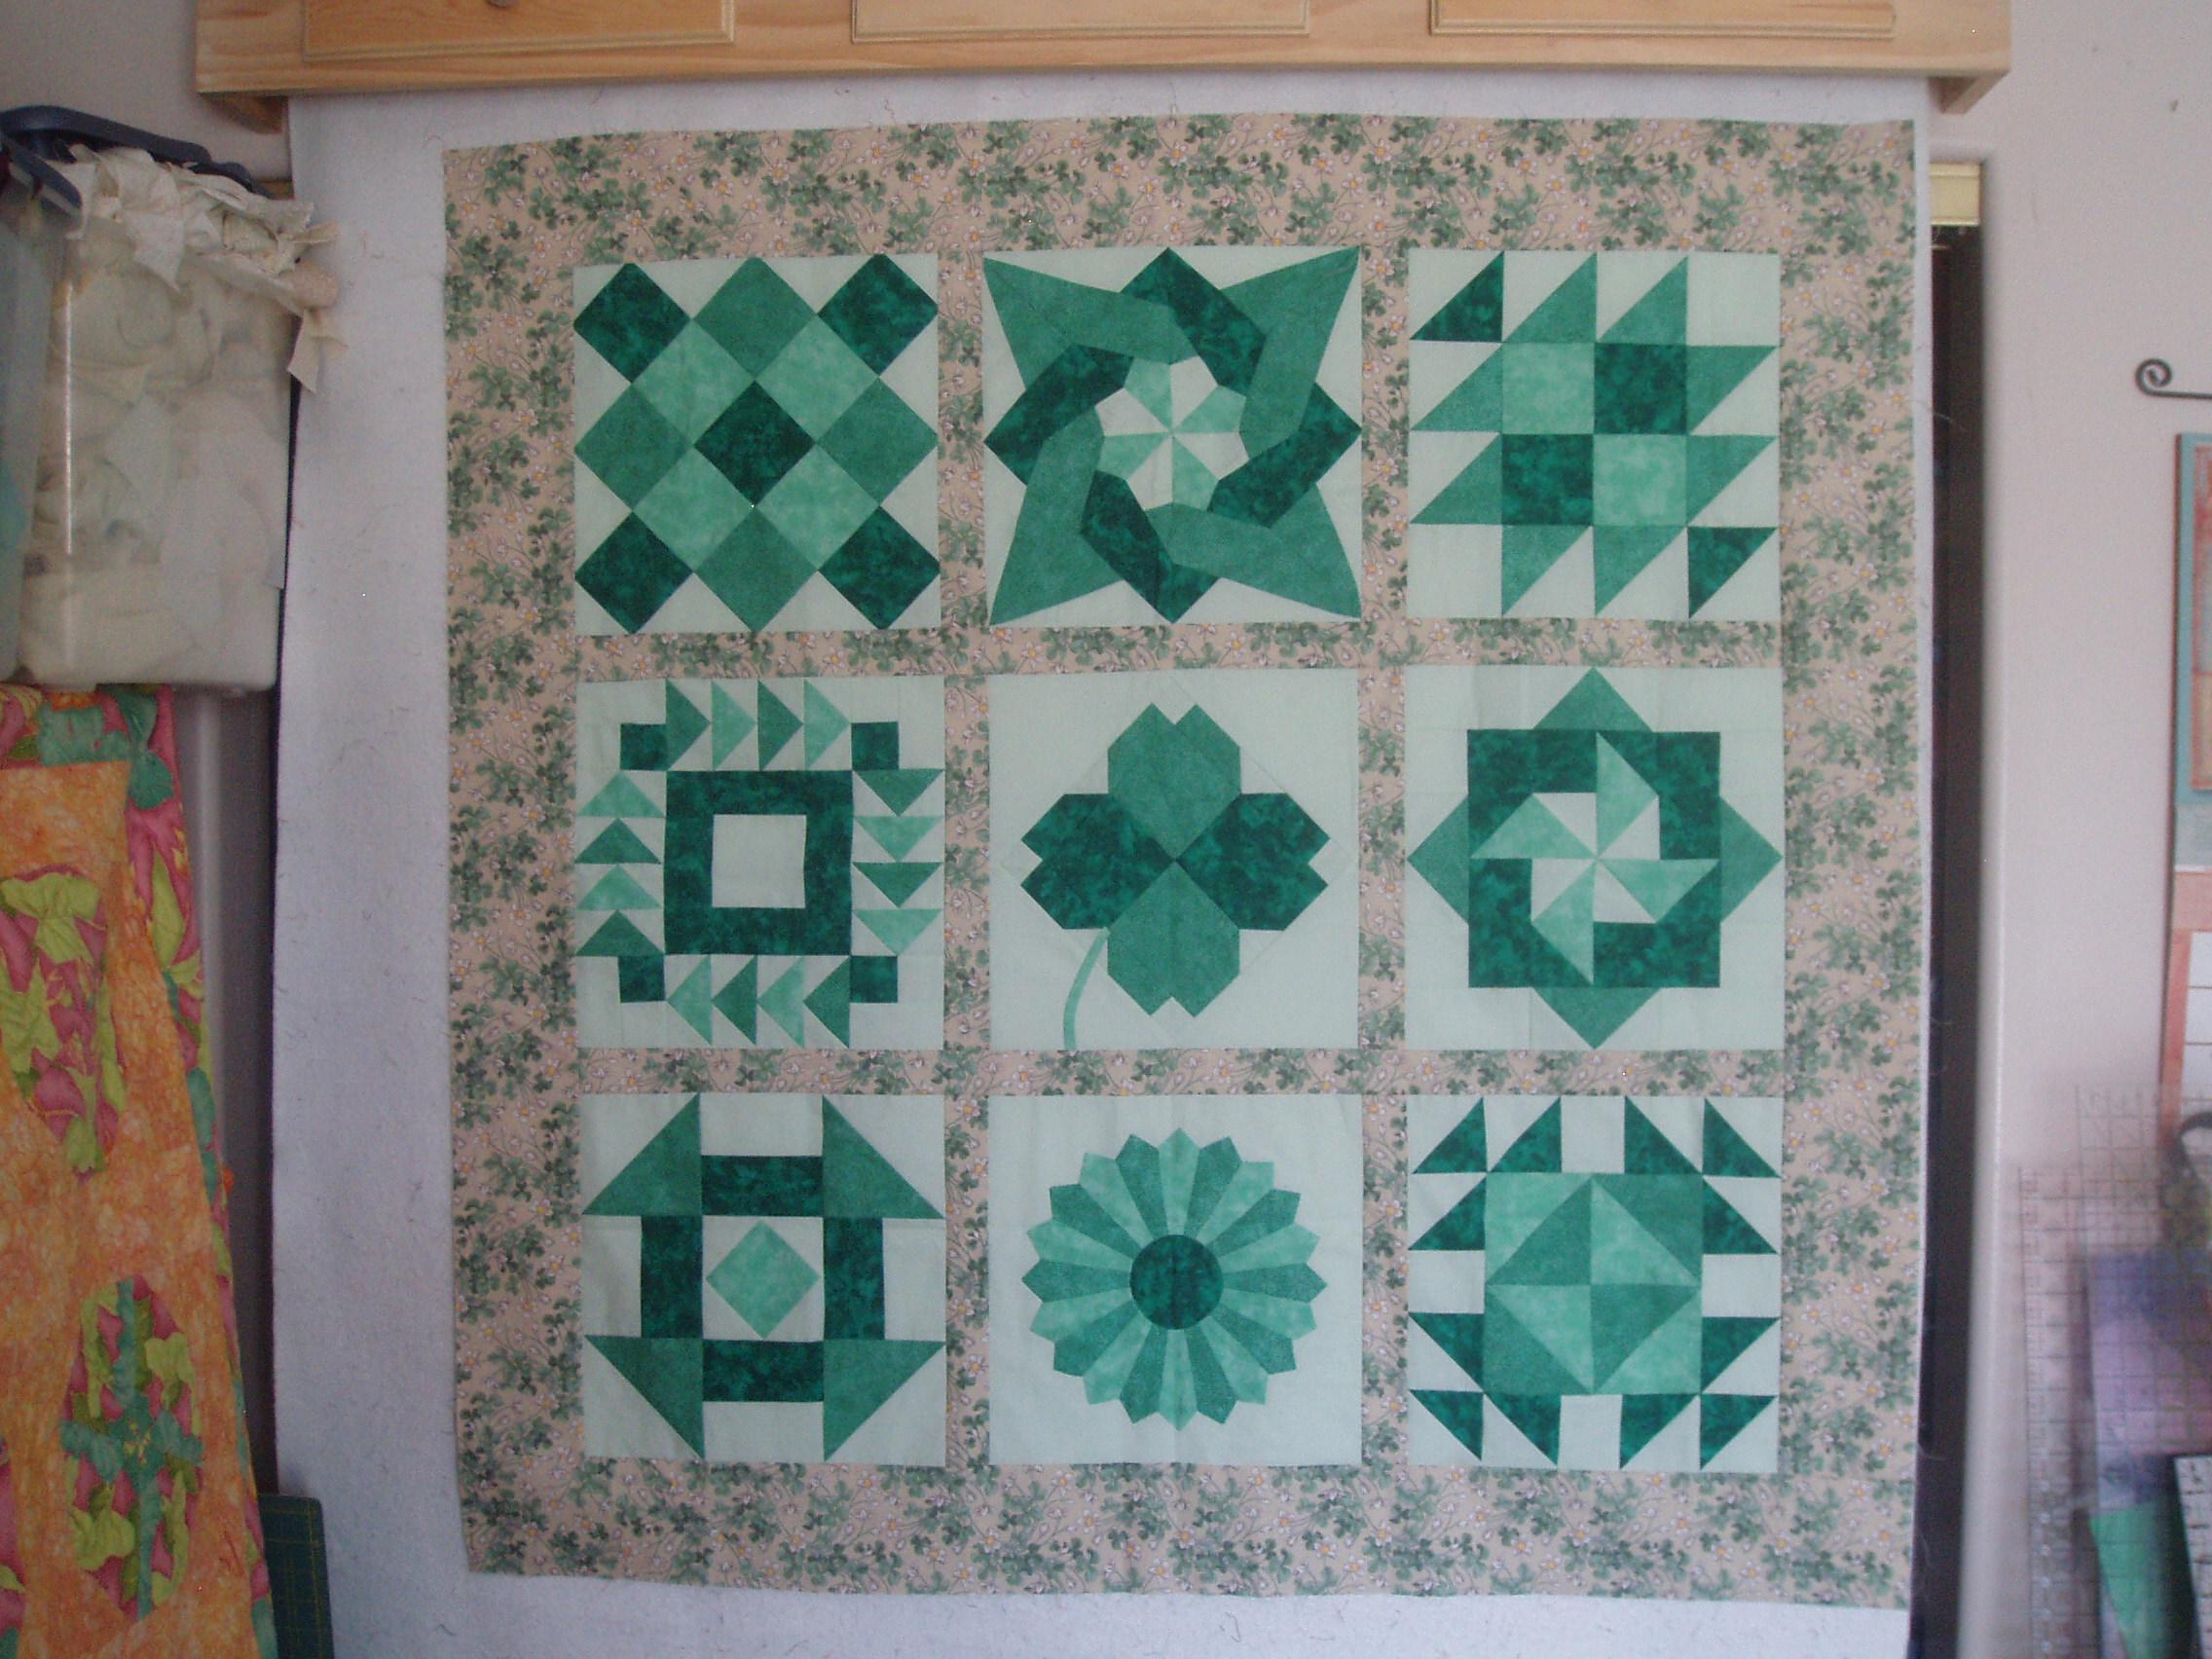 Name:  St. Patricks wall quilt.jpg.JPG Views: 2229 Size:  878.8 KB